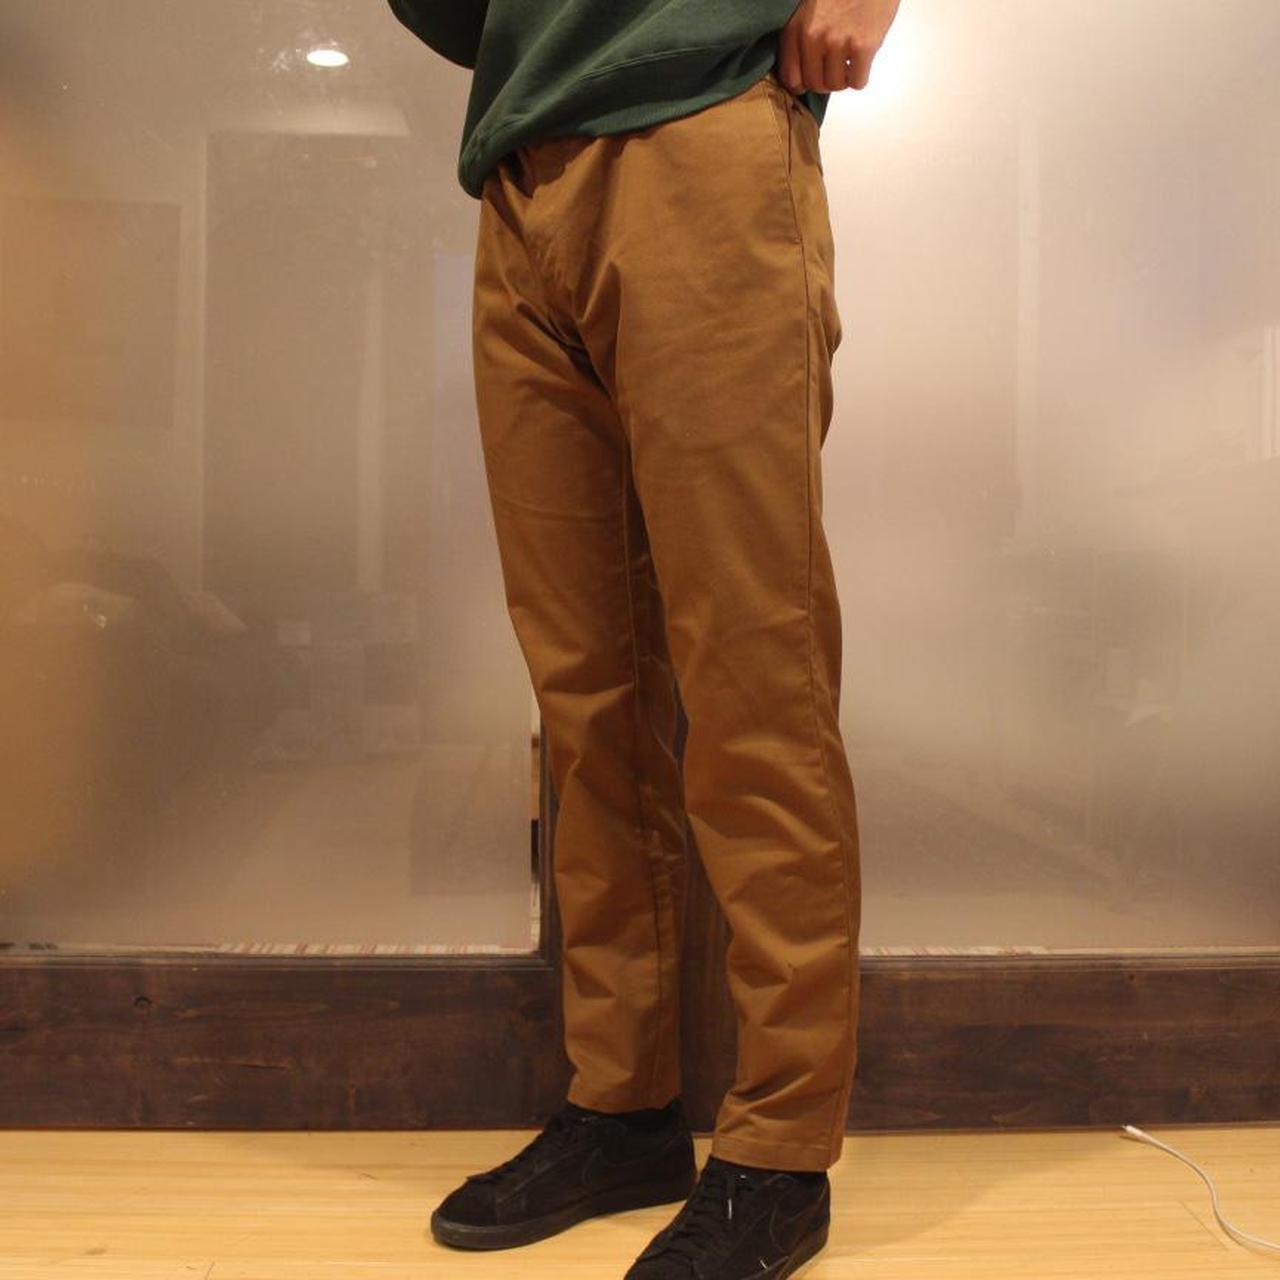 Product Image 1 - Carhartt wip carpenter pants great